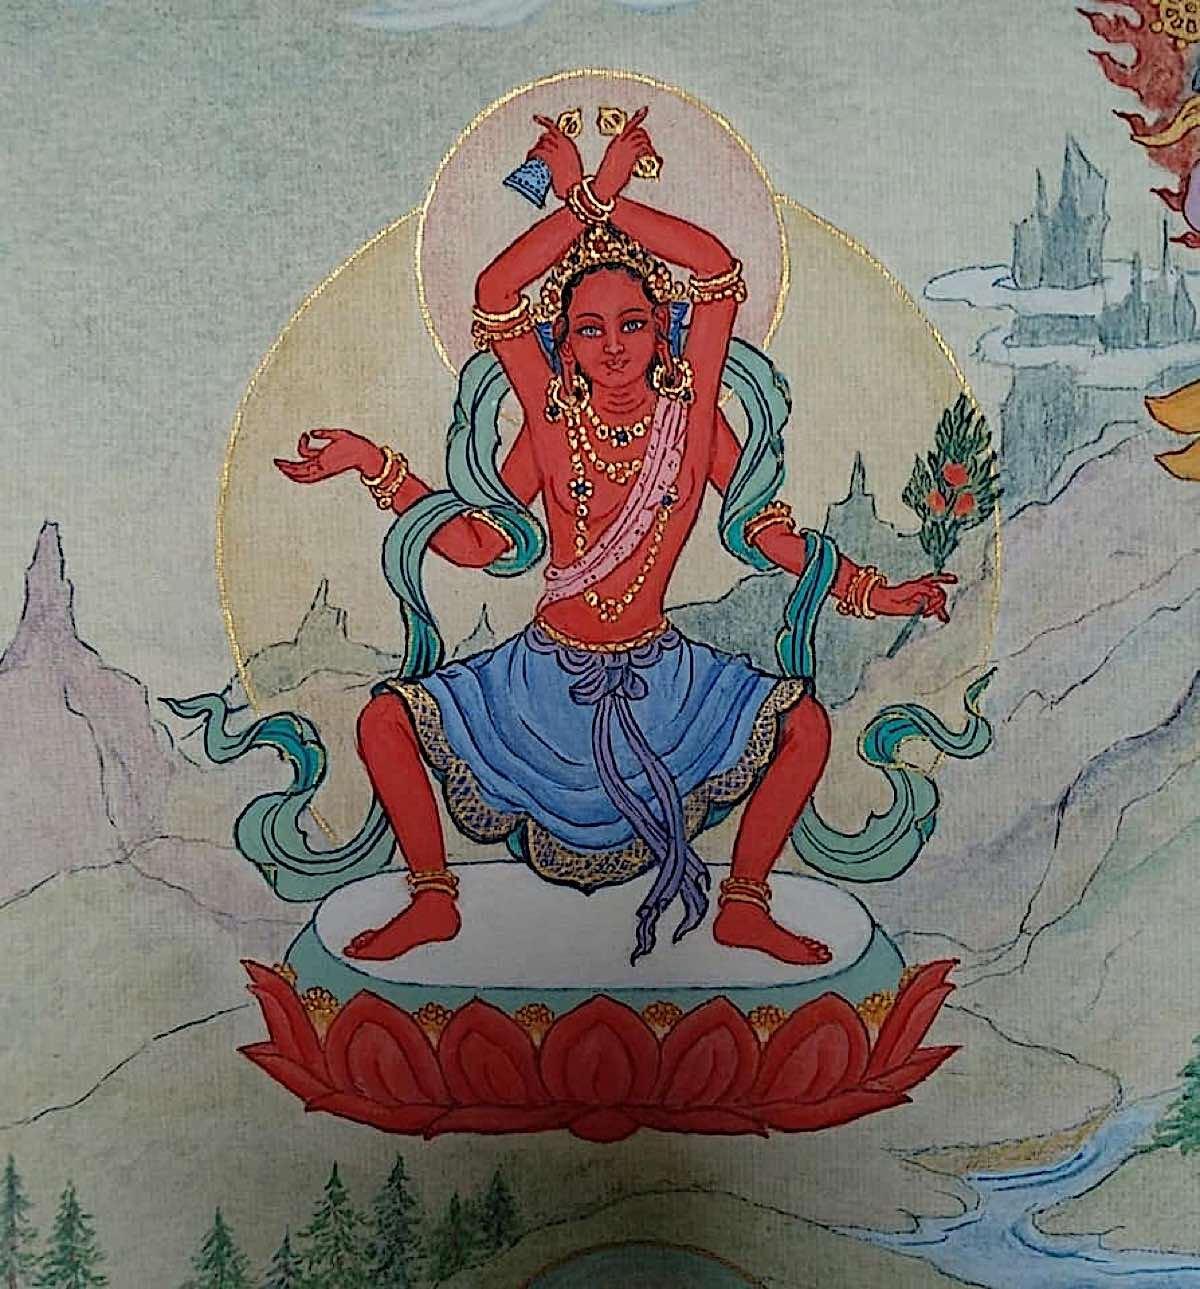 Buddha Weekly 9 Tara Granter of Boons Vara da Tara 21 Taras Thankha by Angeli Lhadripa Shkonda Buddhism